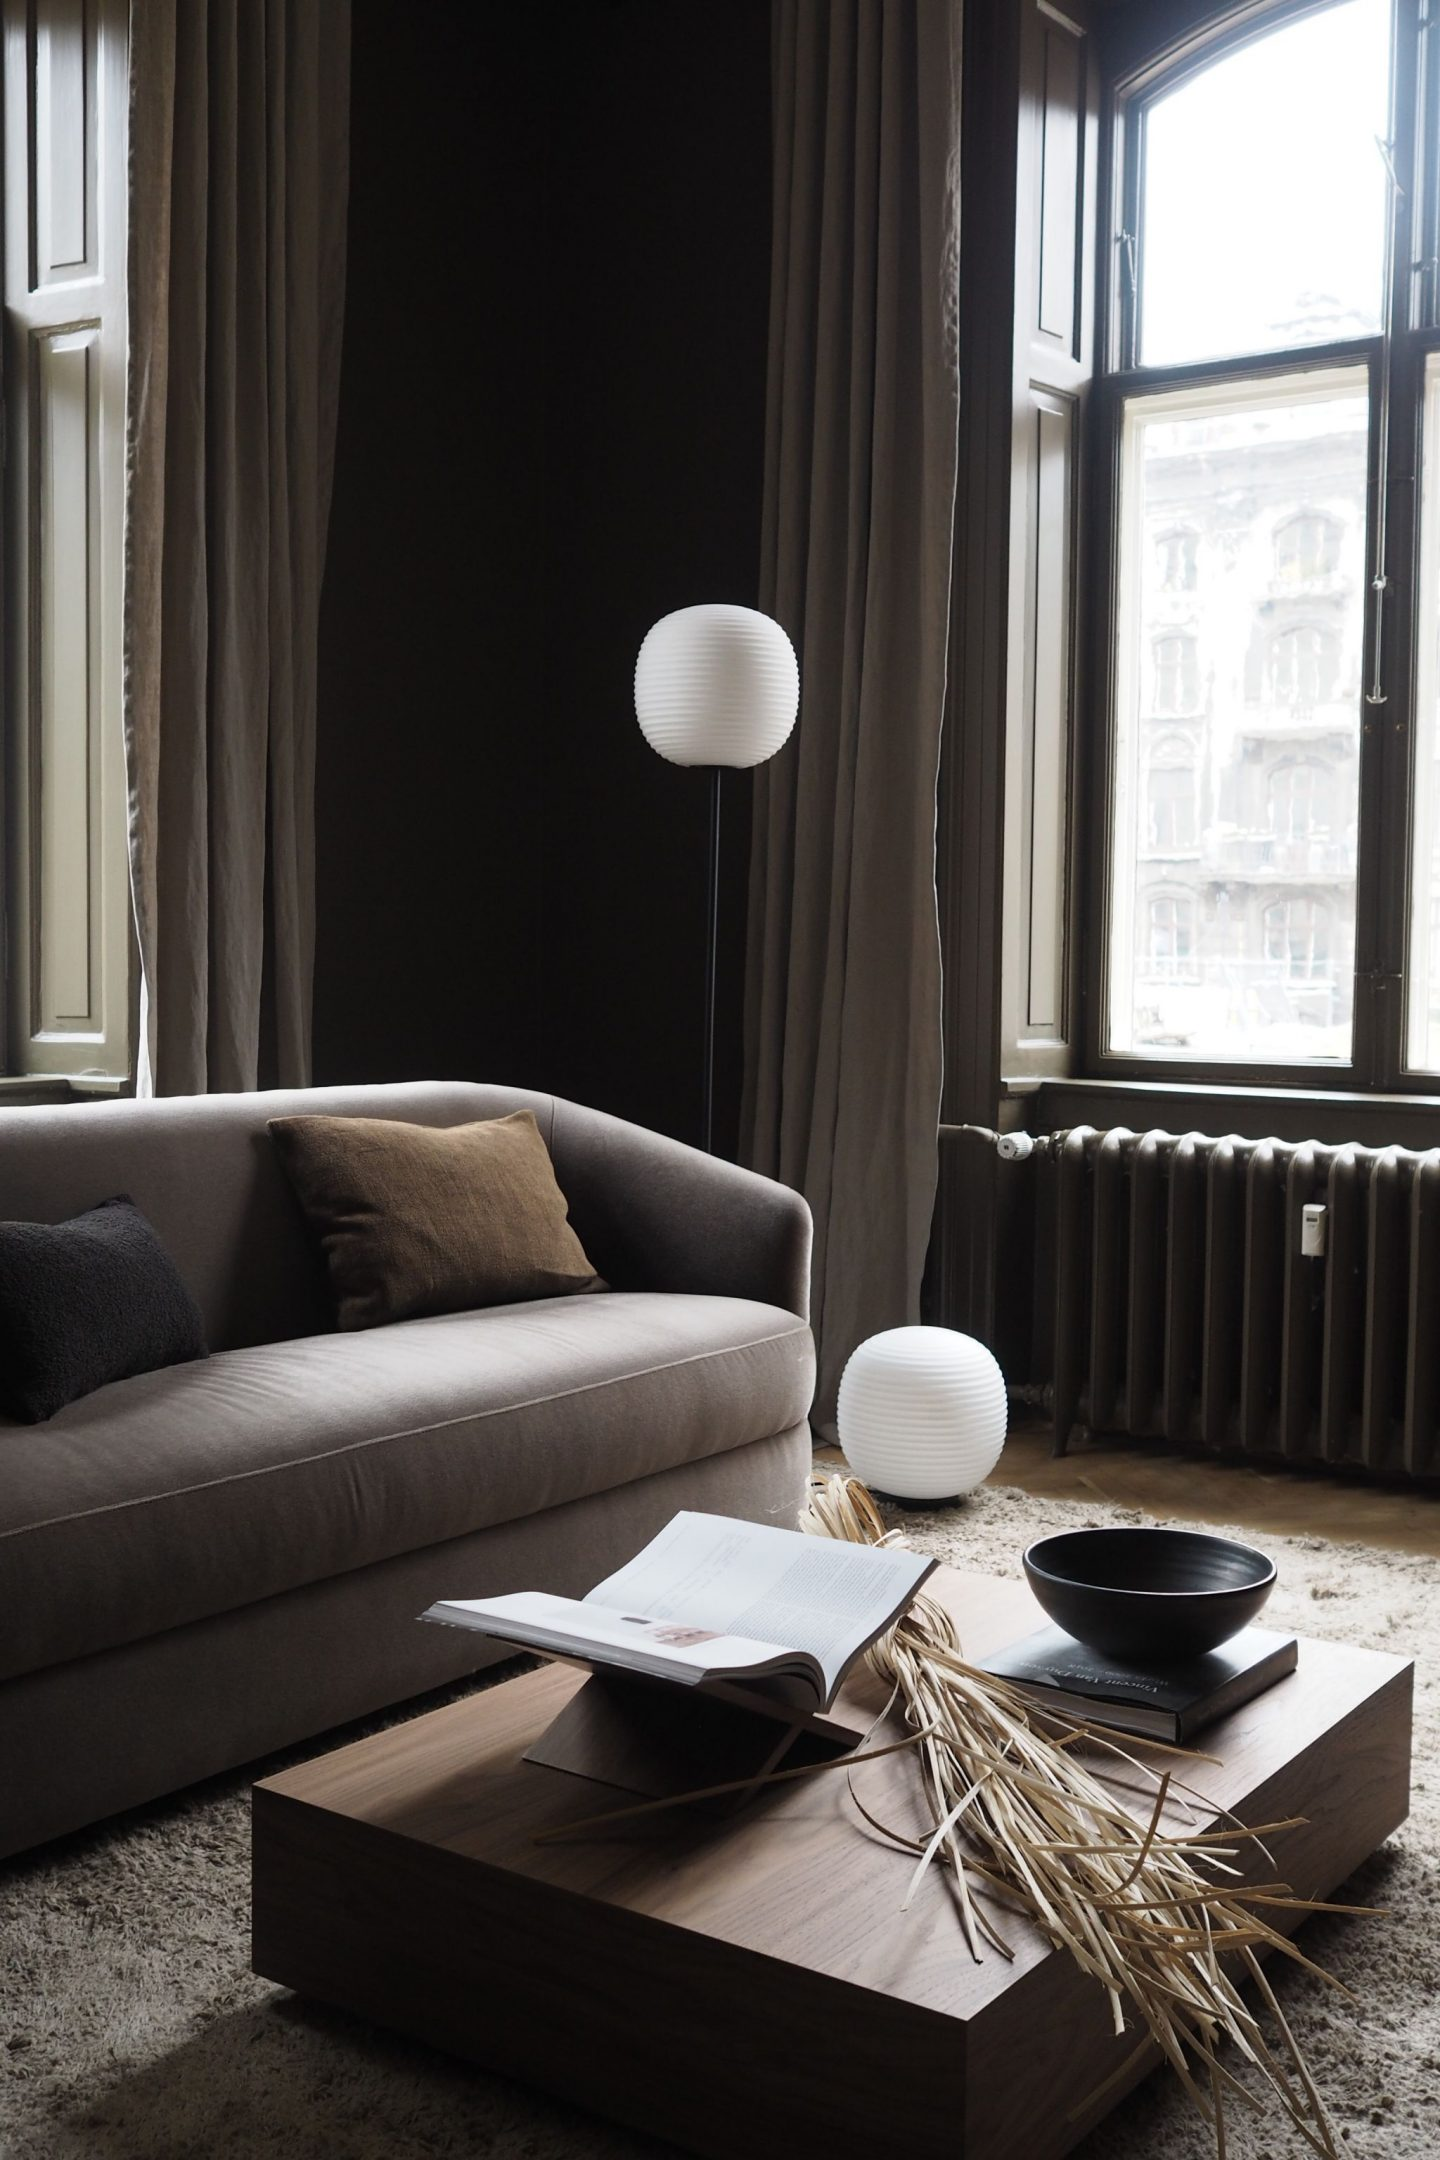 Copenhagen's 3 days of design event, New Works showroom, Lotta Agaton stylist, Hello Peagreen